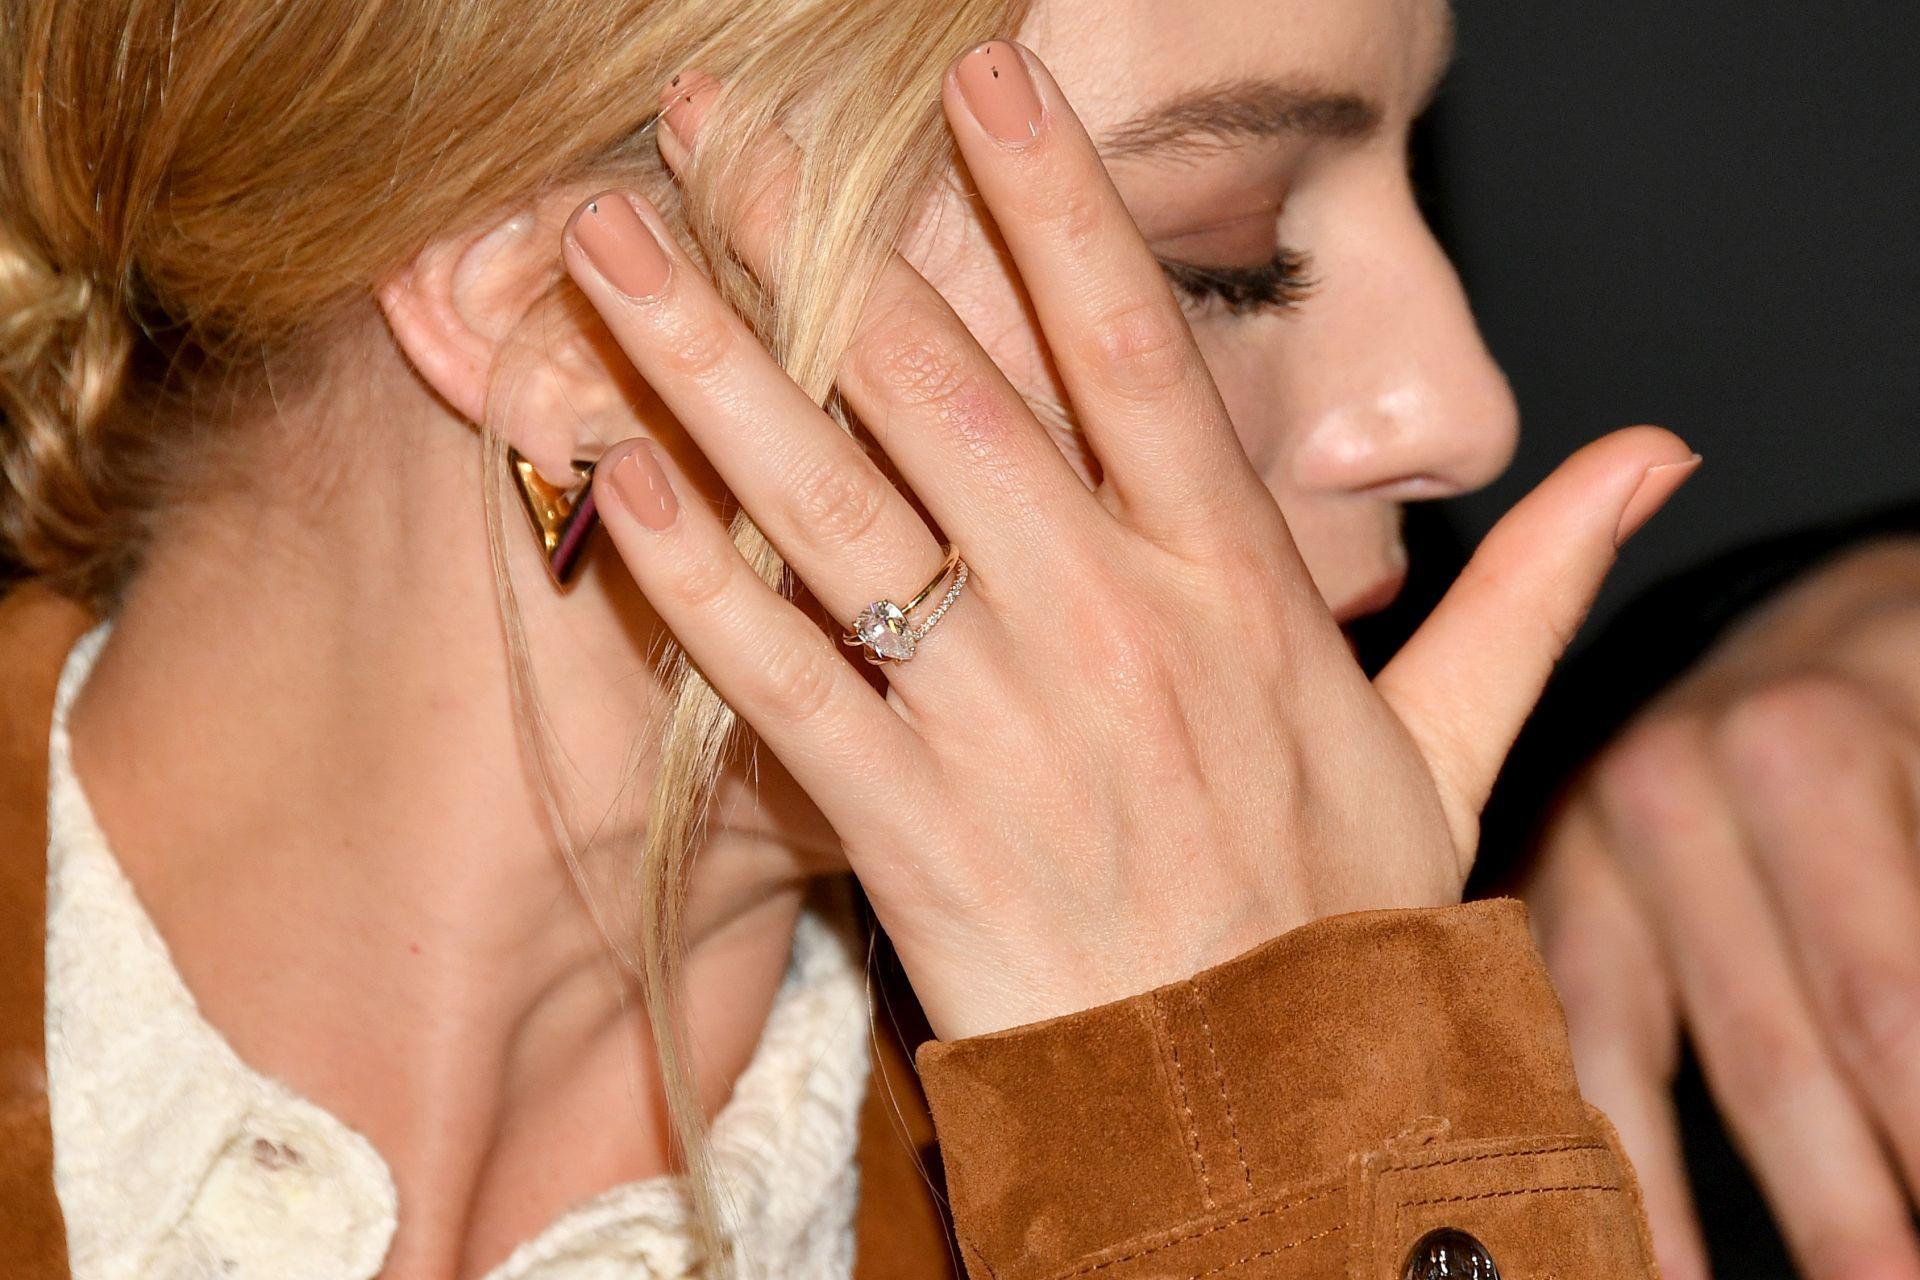 Margot Robbienude manikűrrel